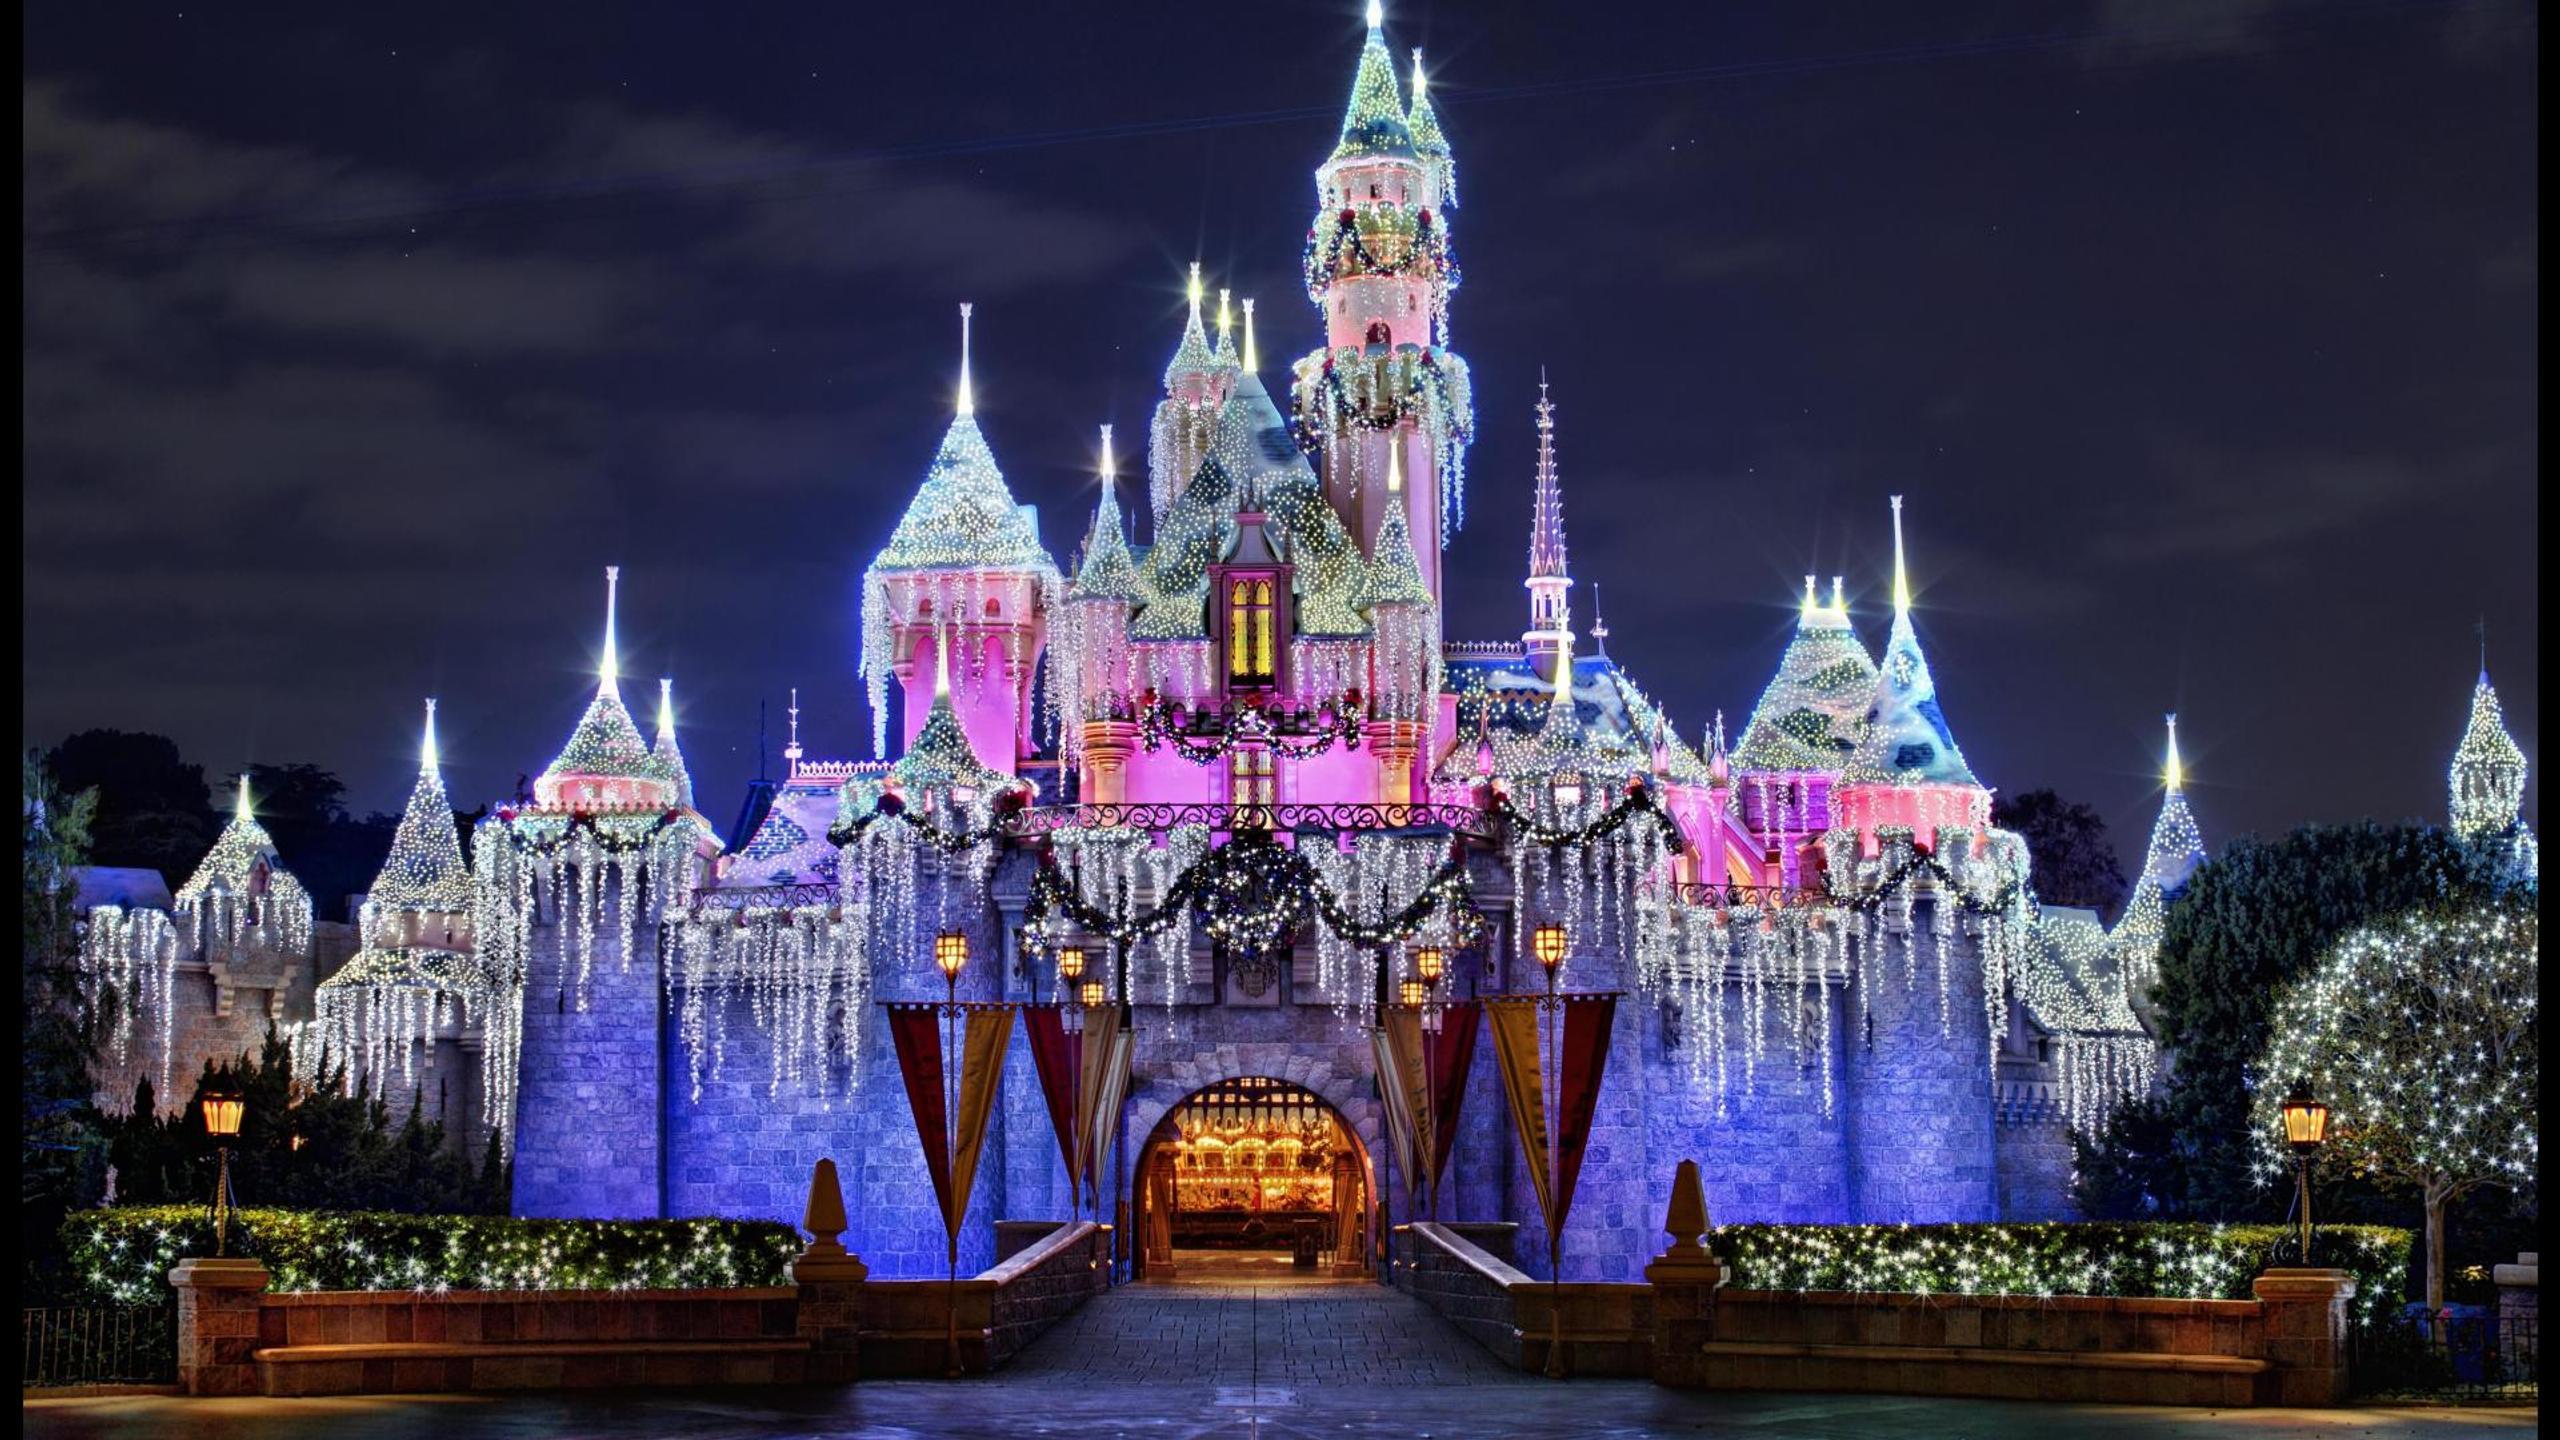 Cool Wallpaper Macbook Disneyland - disneyland-paris-in-winter-spirit-hd-wallpaper-2560x1440  HD_988176.jpg